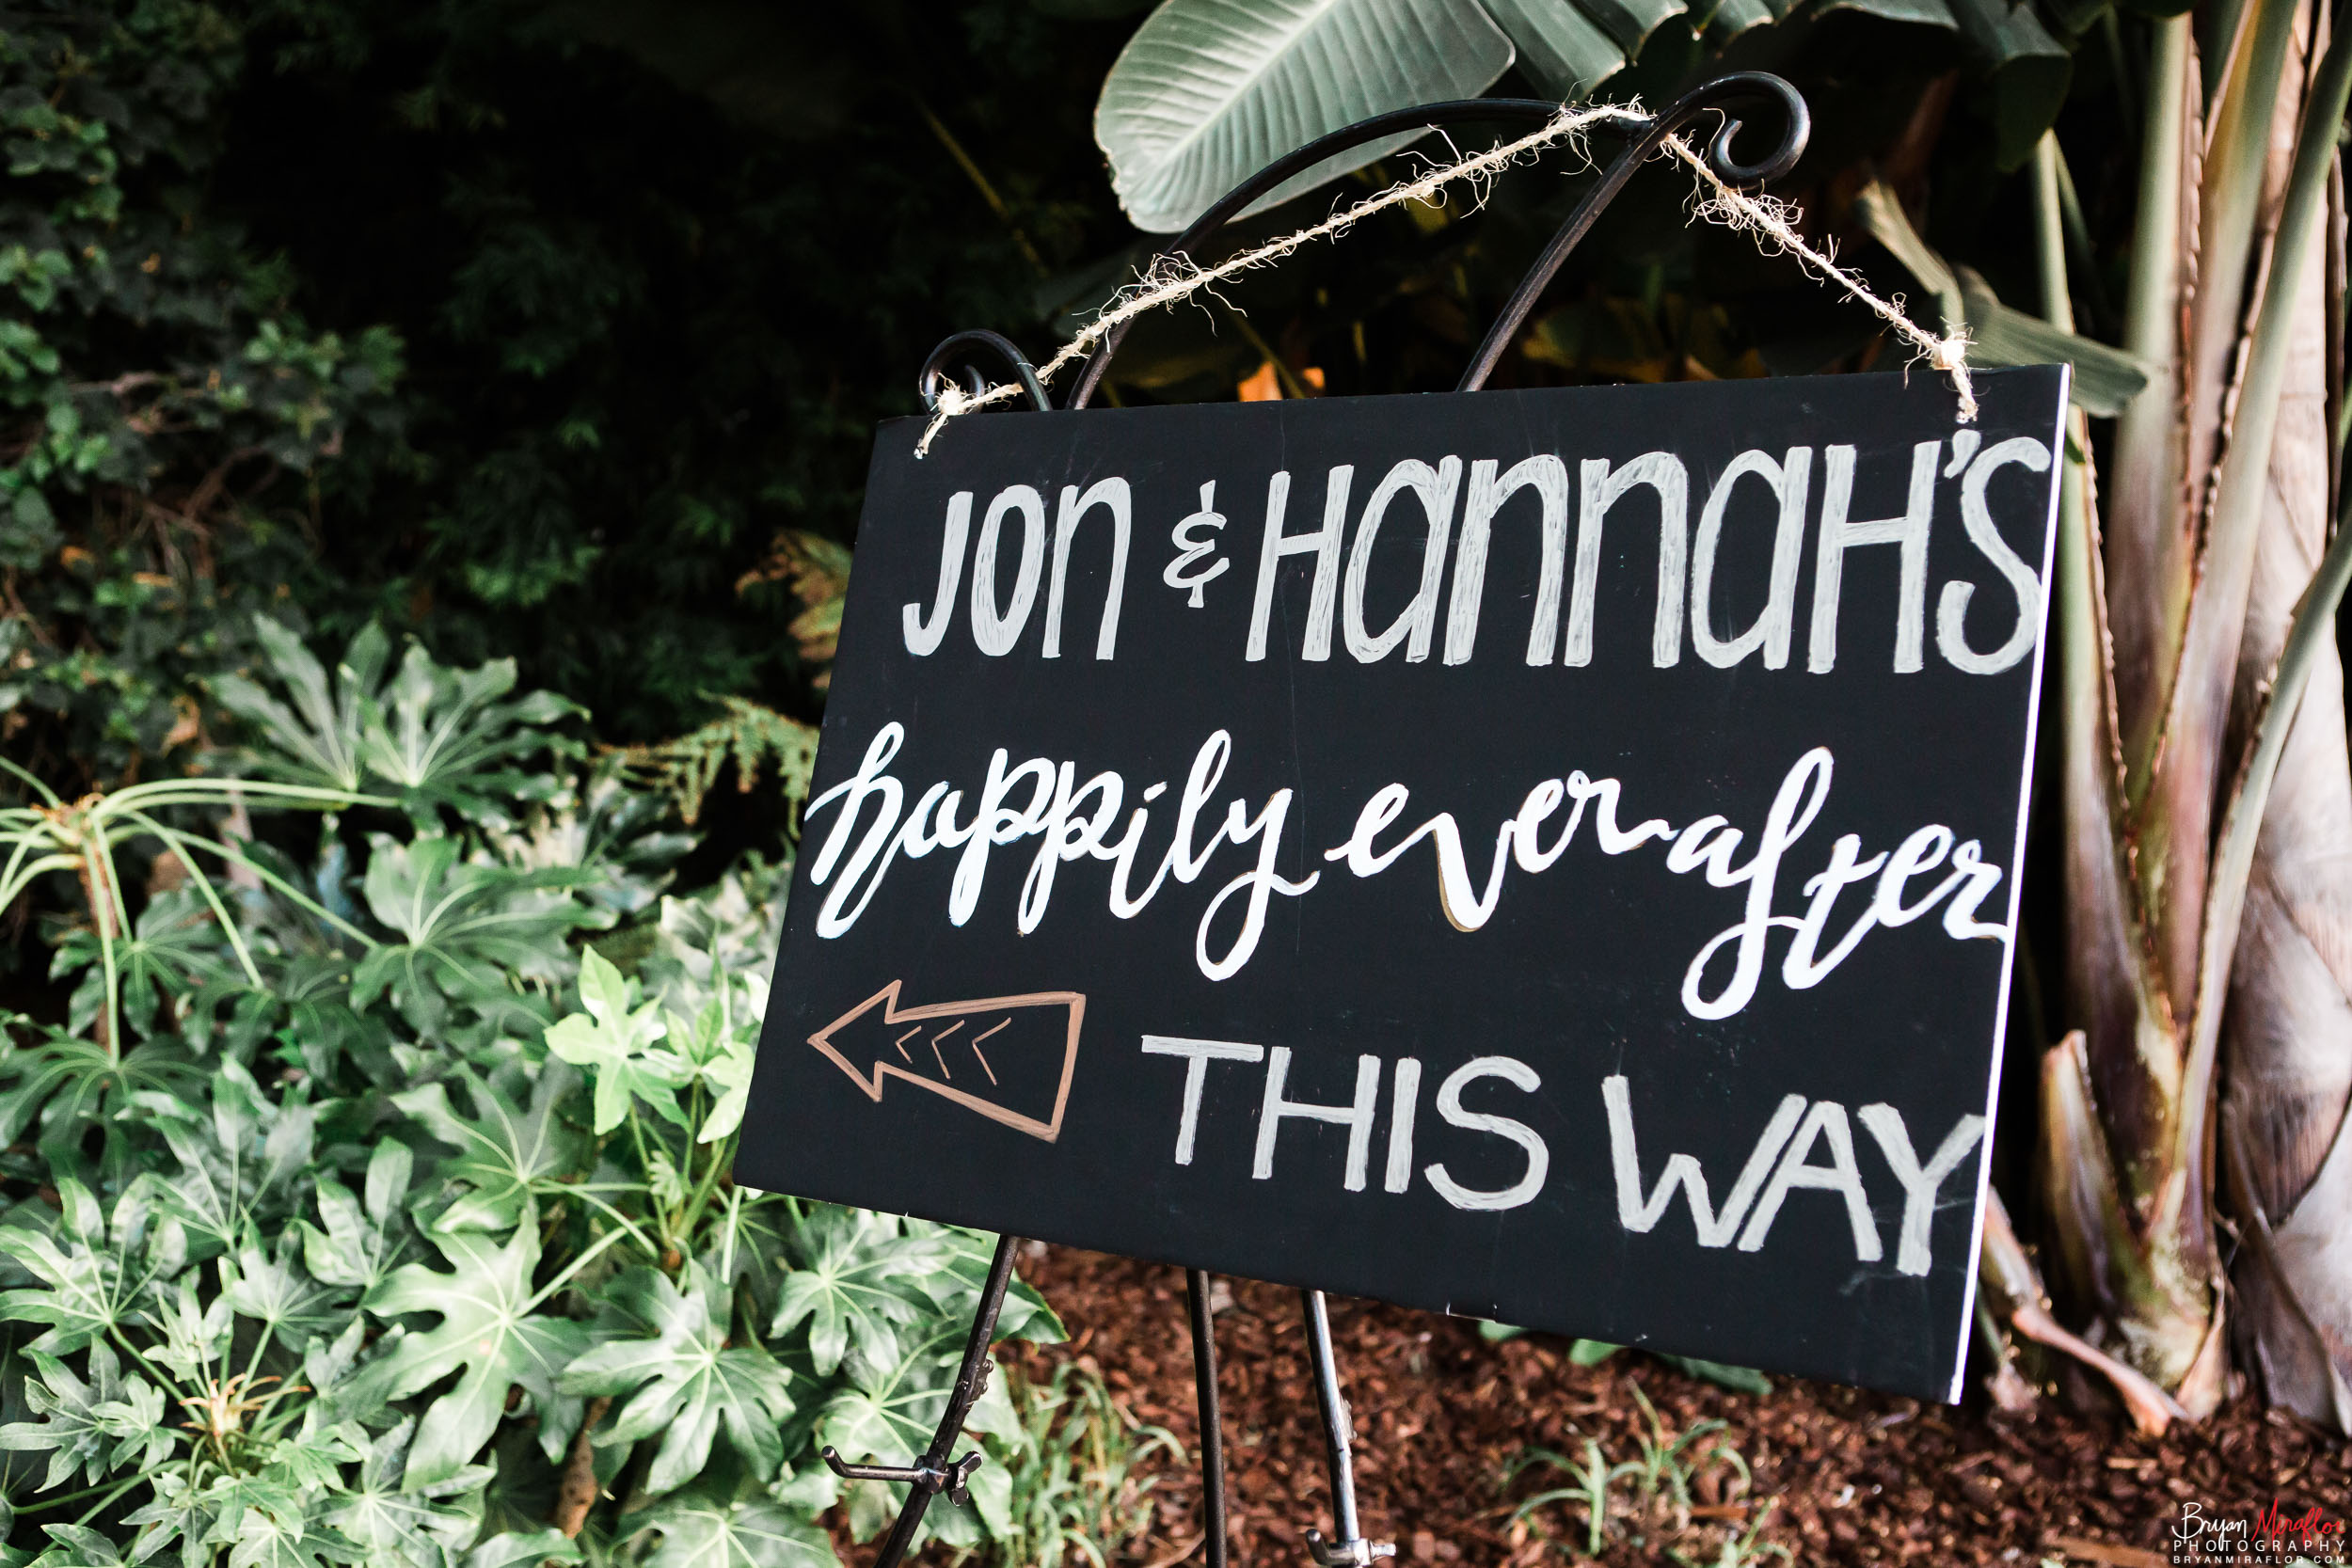 Bryan-Miraflor-Photography-Hannah-Jonathan-Married-Grand-Traditions-Estate-Gardens-Fallbrook-20171222-152.jpg